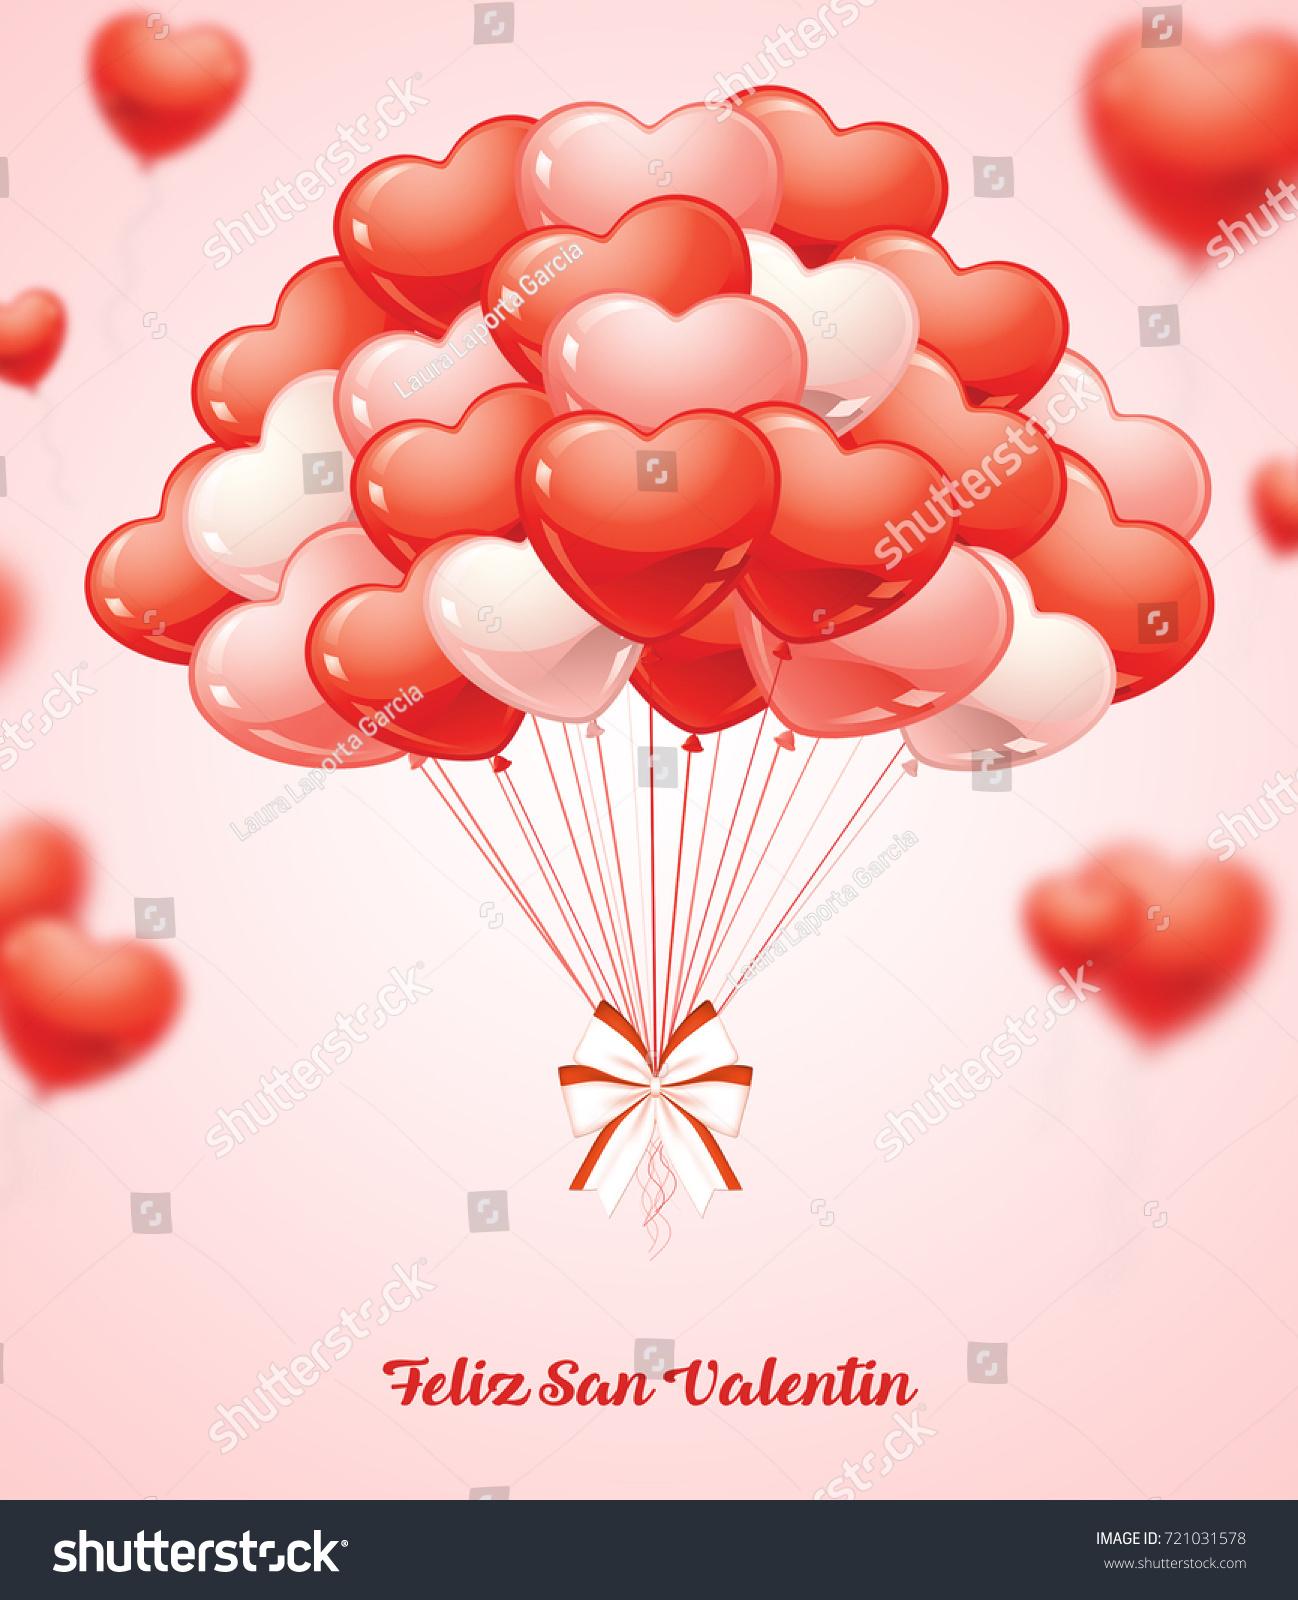 illustration flying bunch red balloon hearts stock illustration